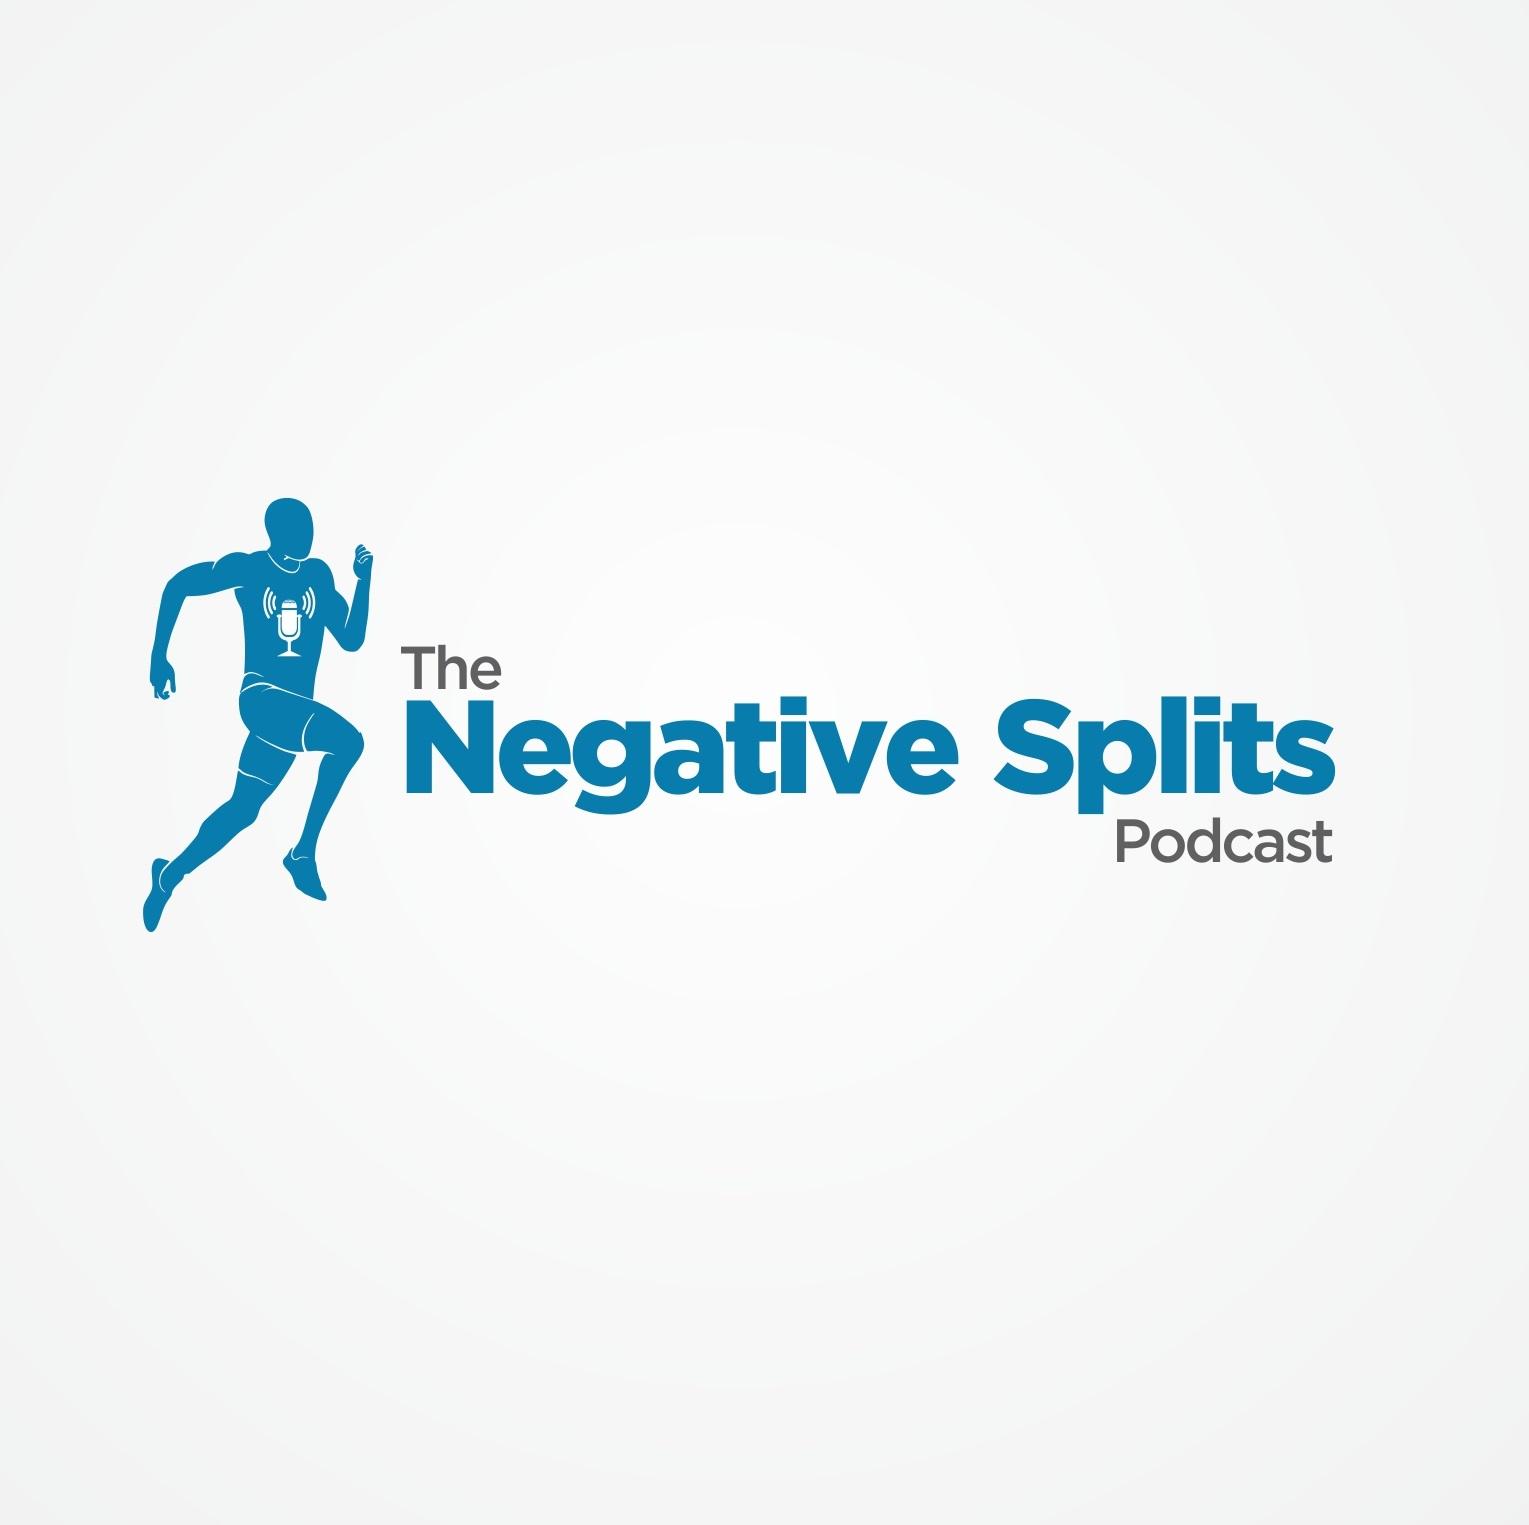 The Negative Splits Podcast logo